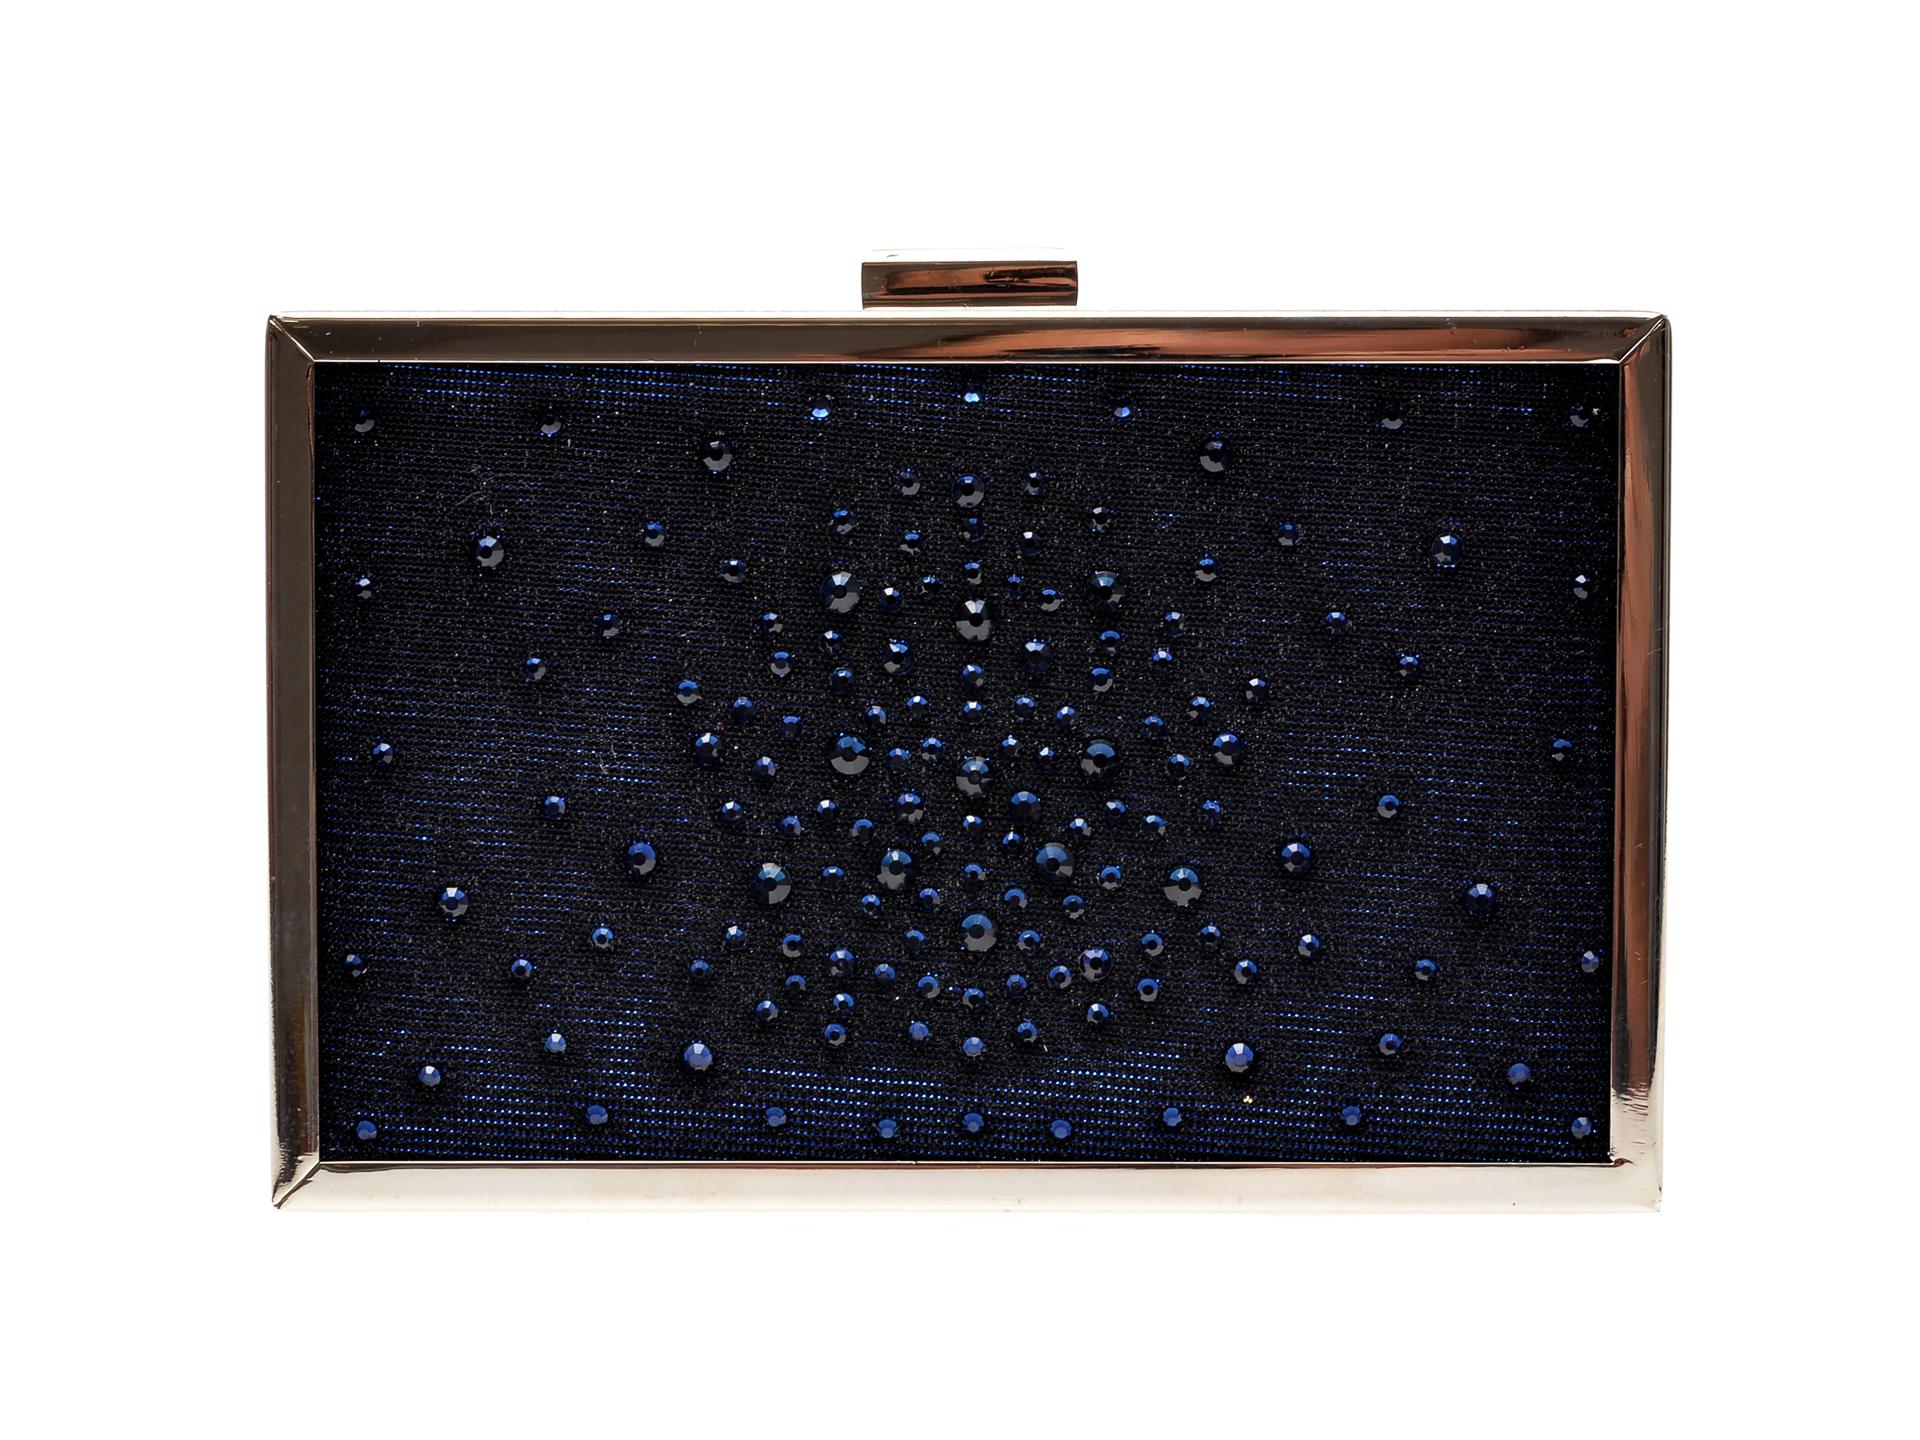 Poseta Plic Menbur Bleumarin, 84414, Din Material Textil